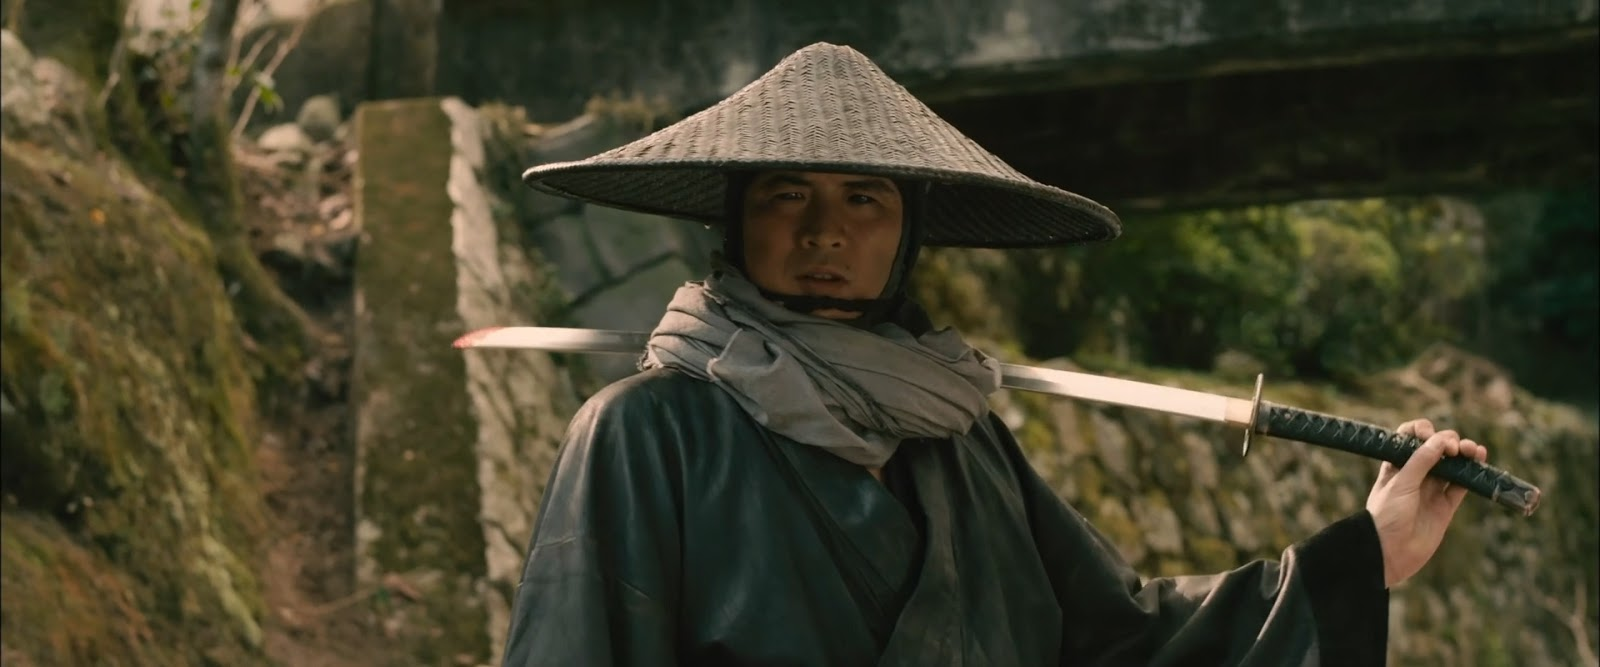 Rurouni Kenshin - Live Action Peliculas